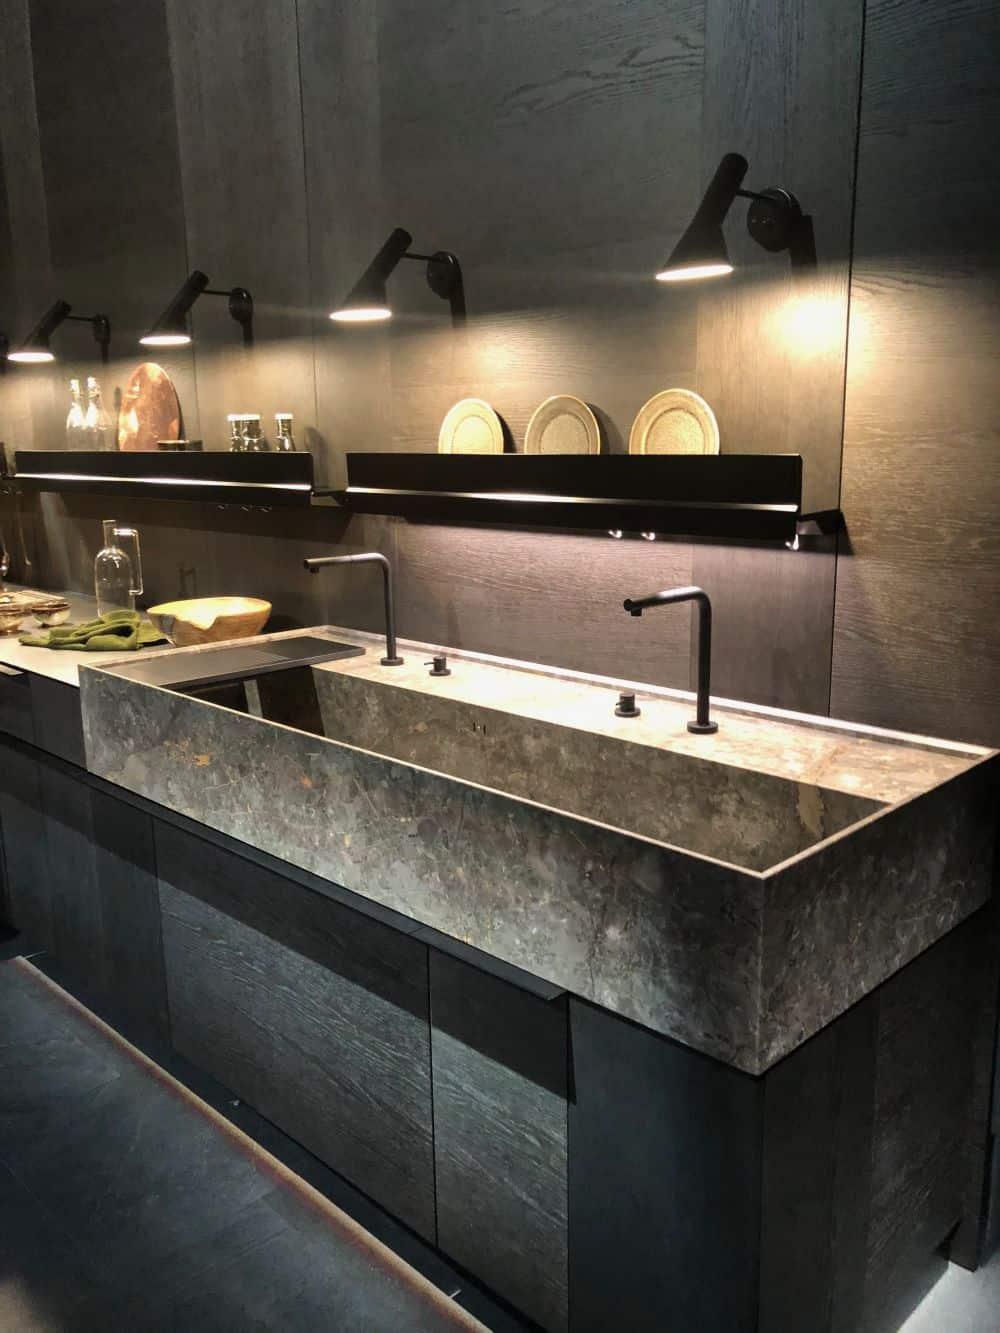 Stylish Kitchens That Scream Timeless